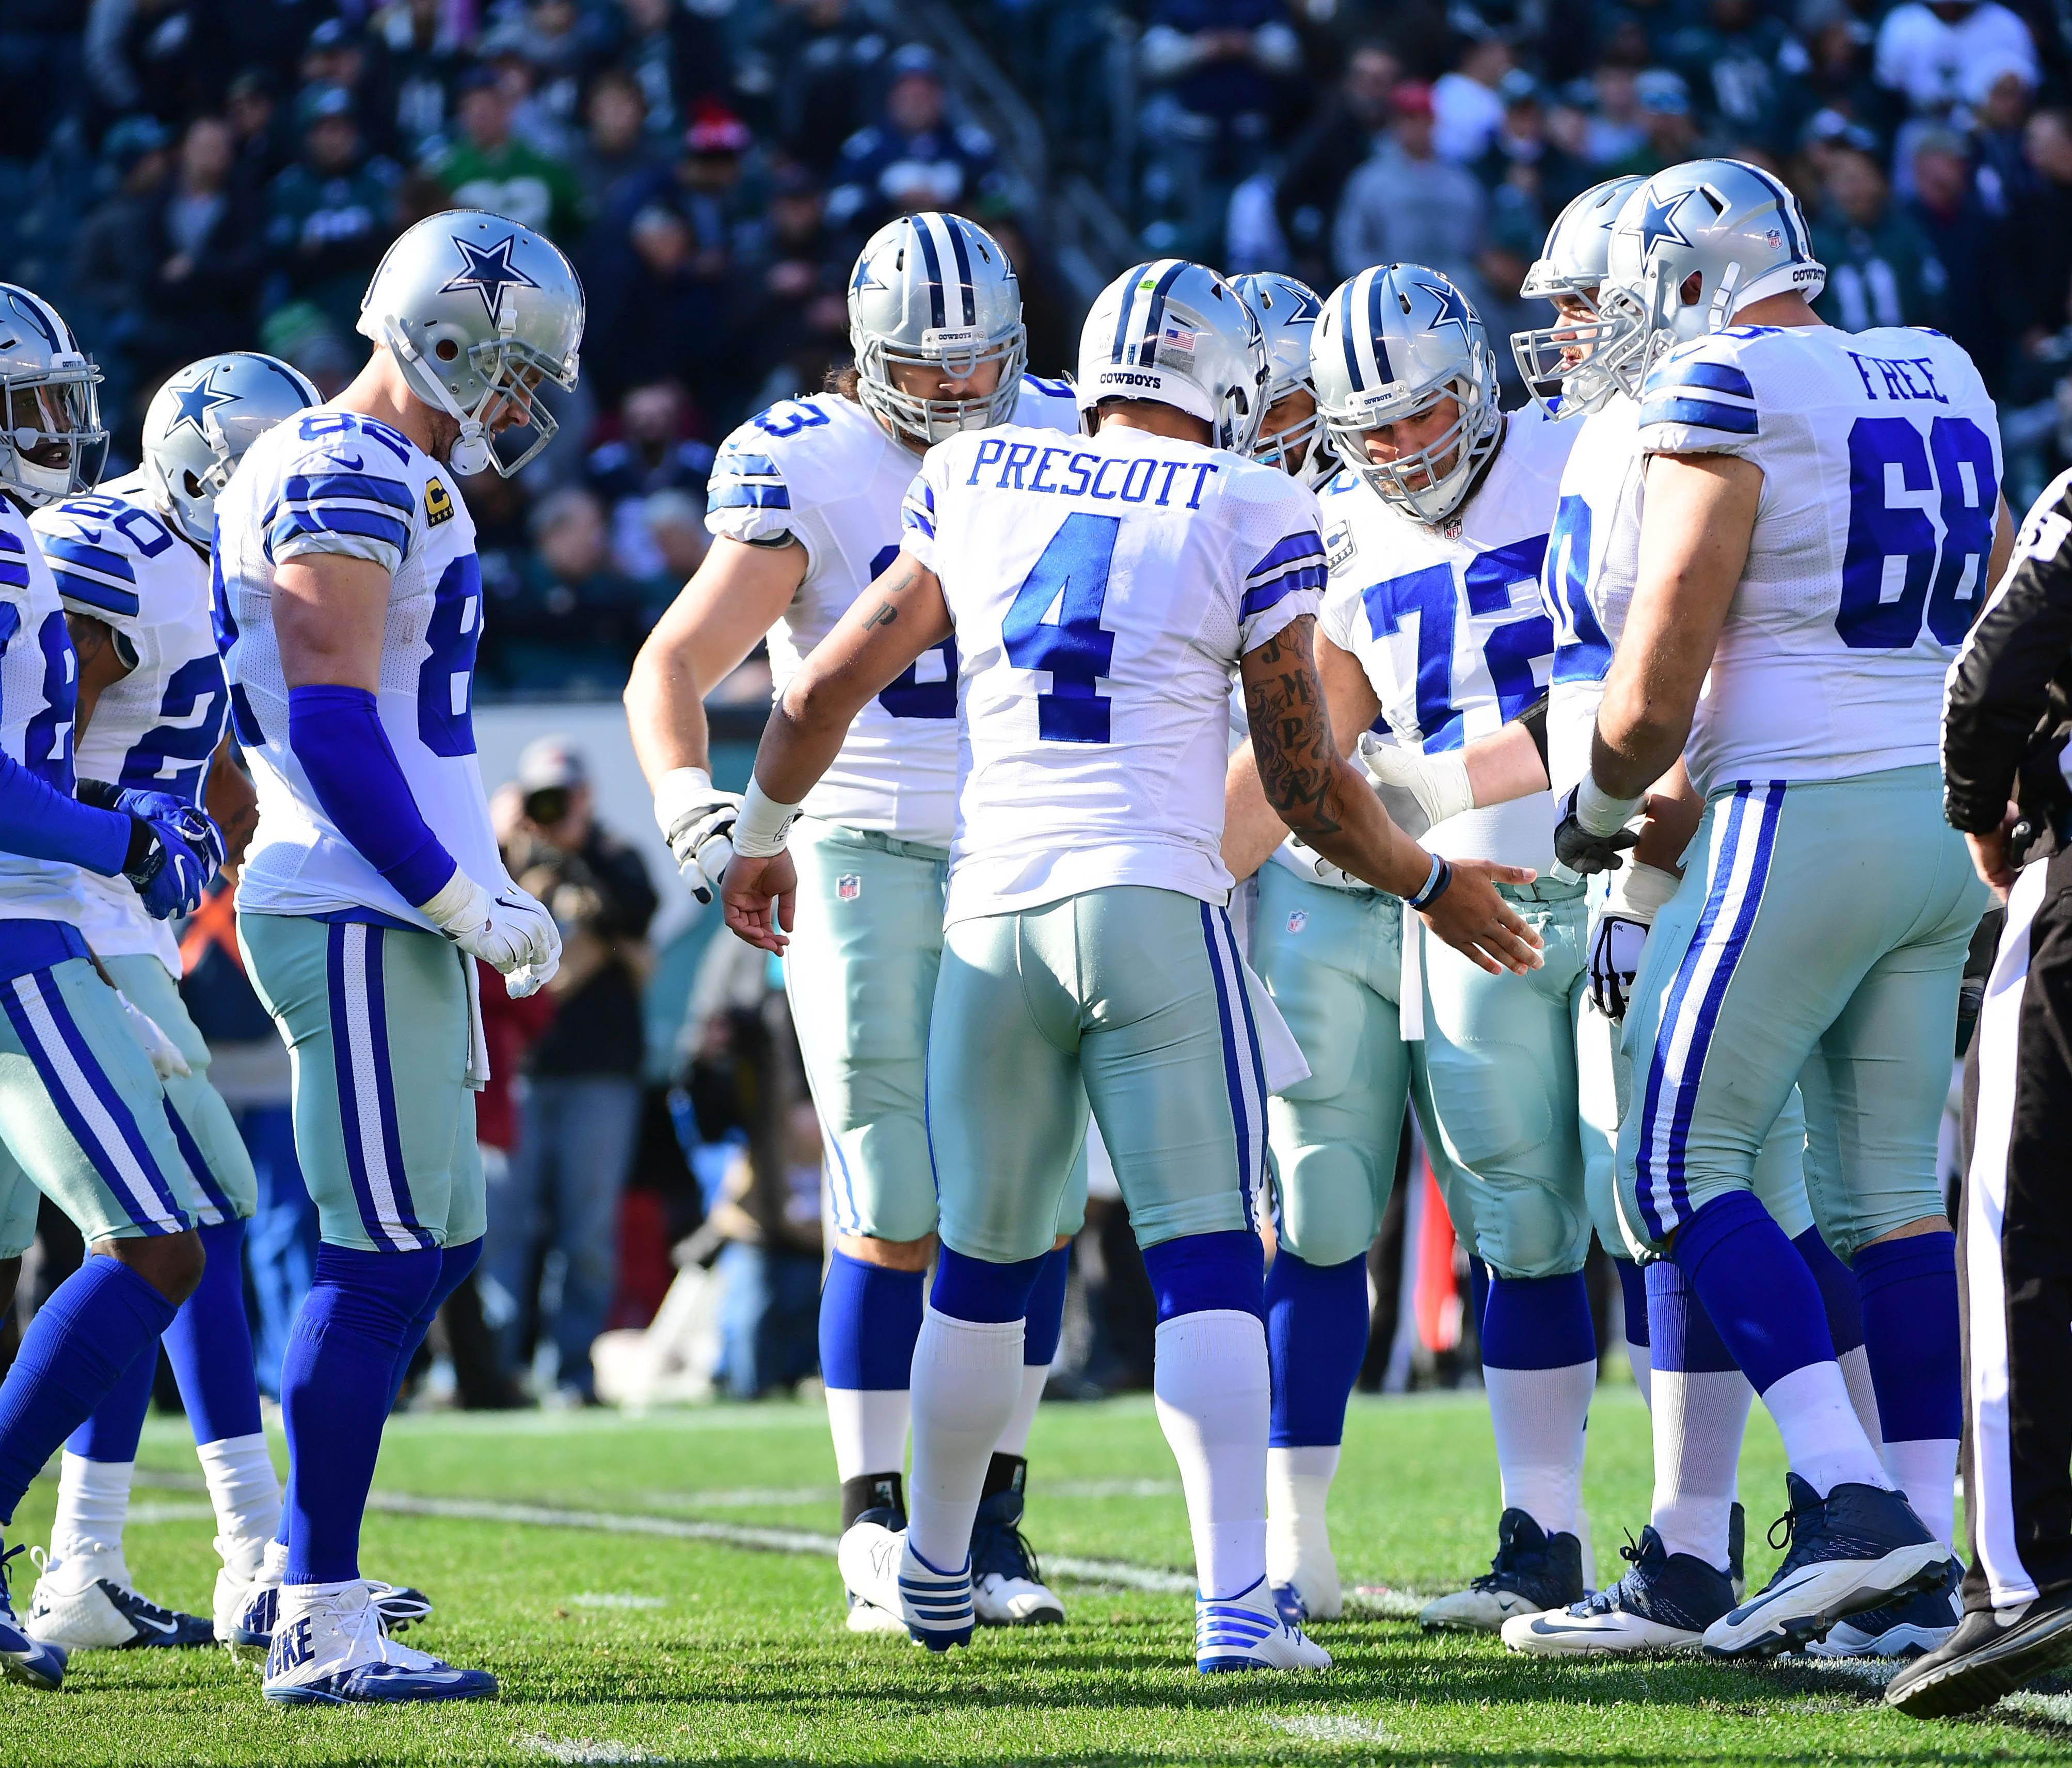 huge discount 8ef63 99e54 NFL Uniform Analysis - Part 4 (The Good)